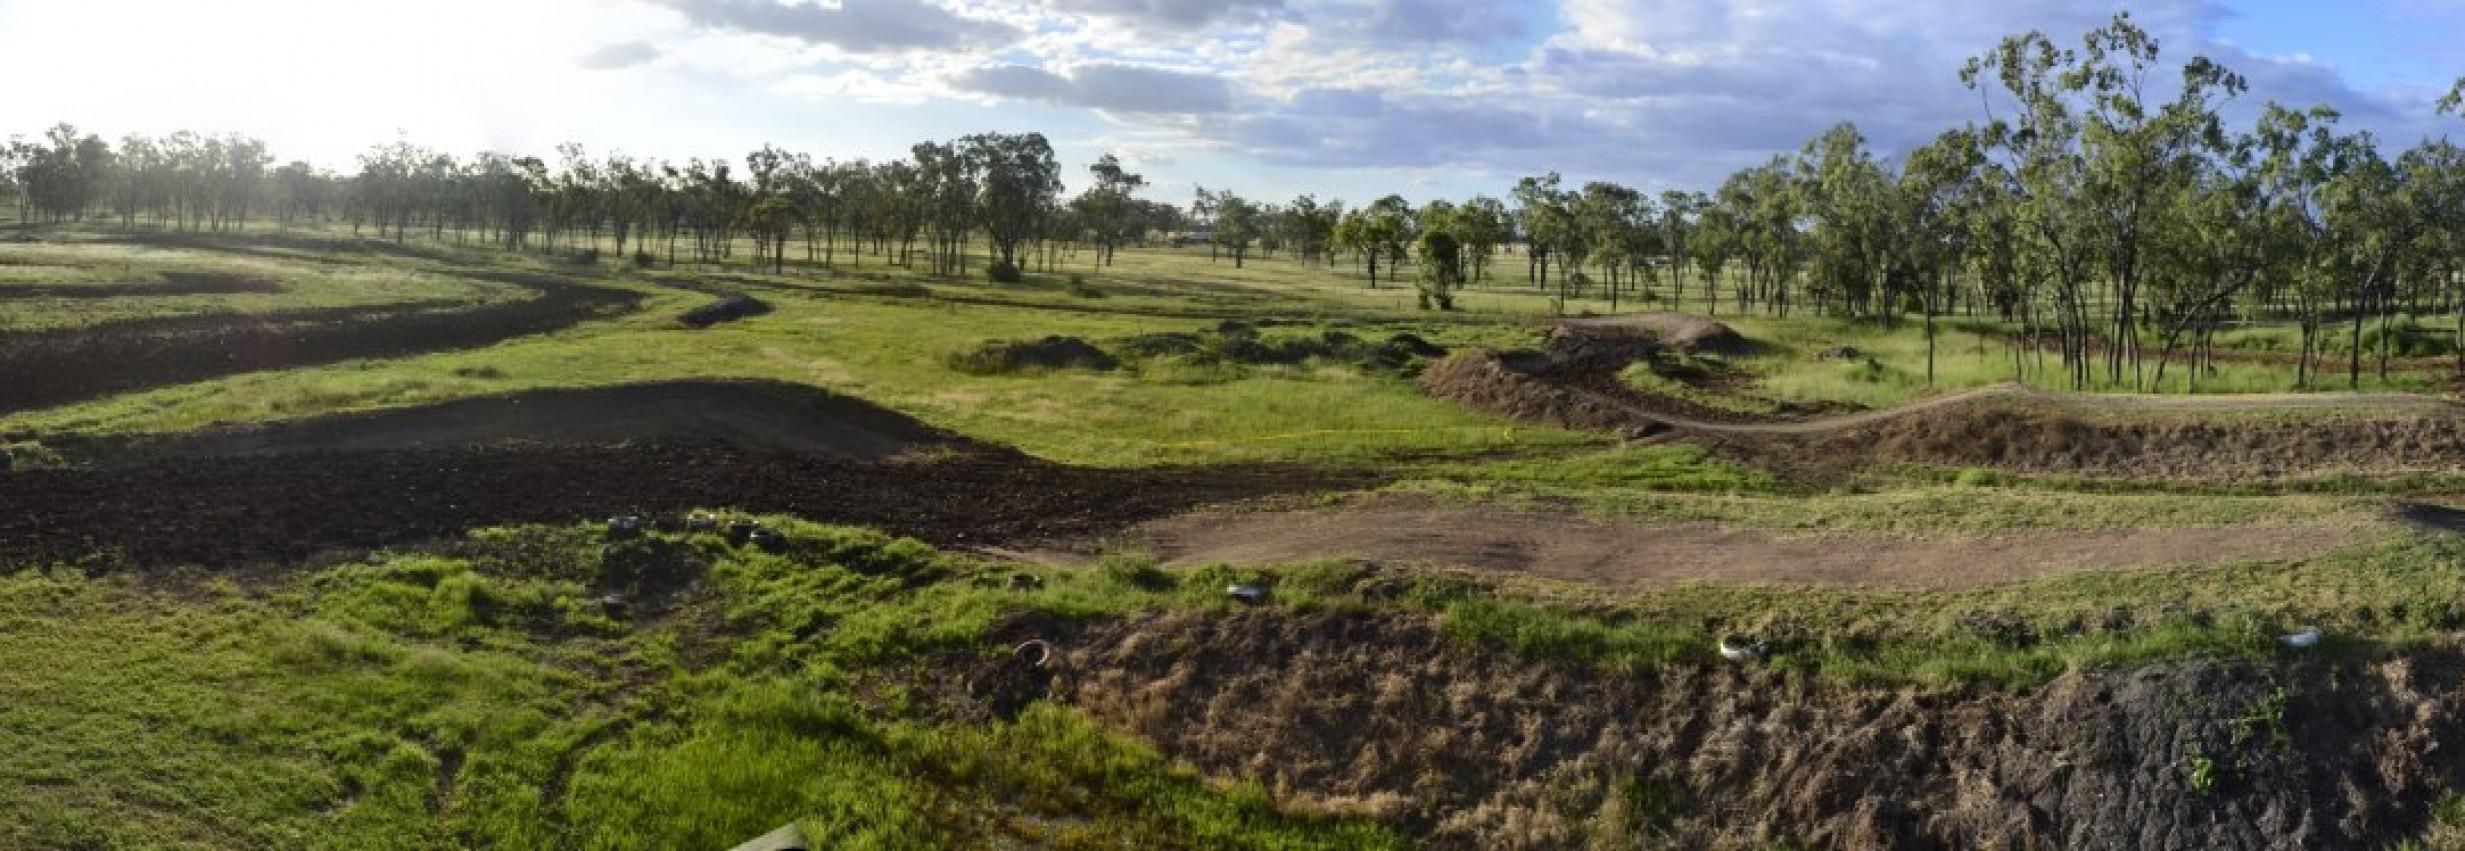 Dalby Motocross Track – Dalby Motocross Club